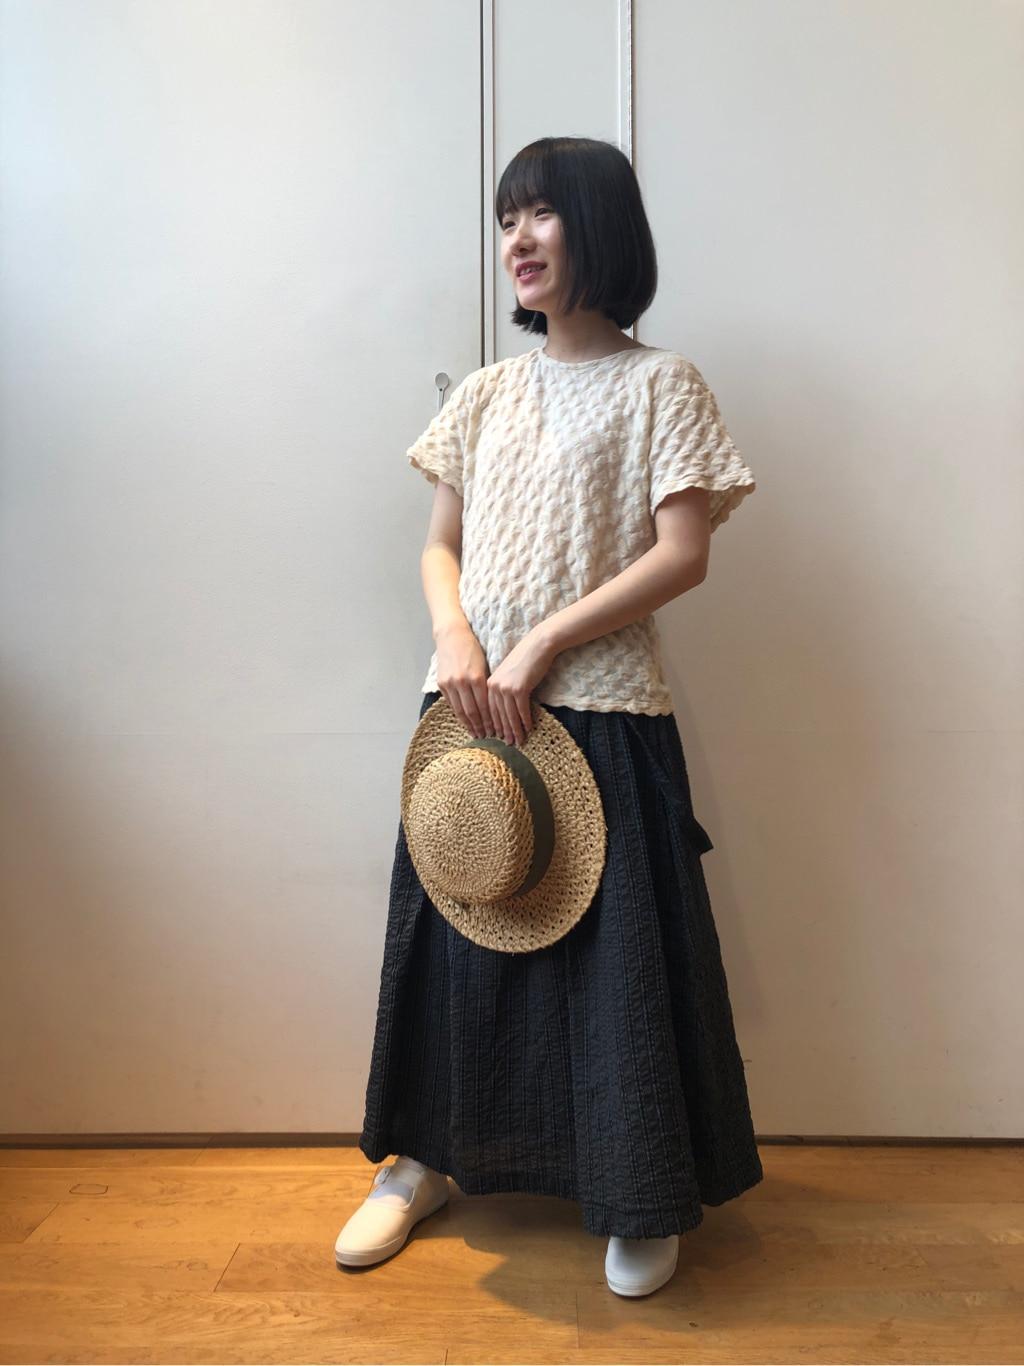 bulle de savon KITTE丸の内 身長:152cm 2020.07.28